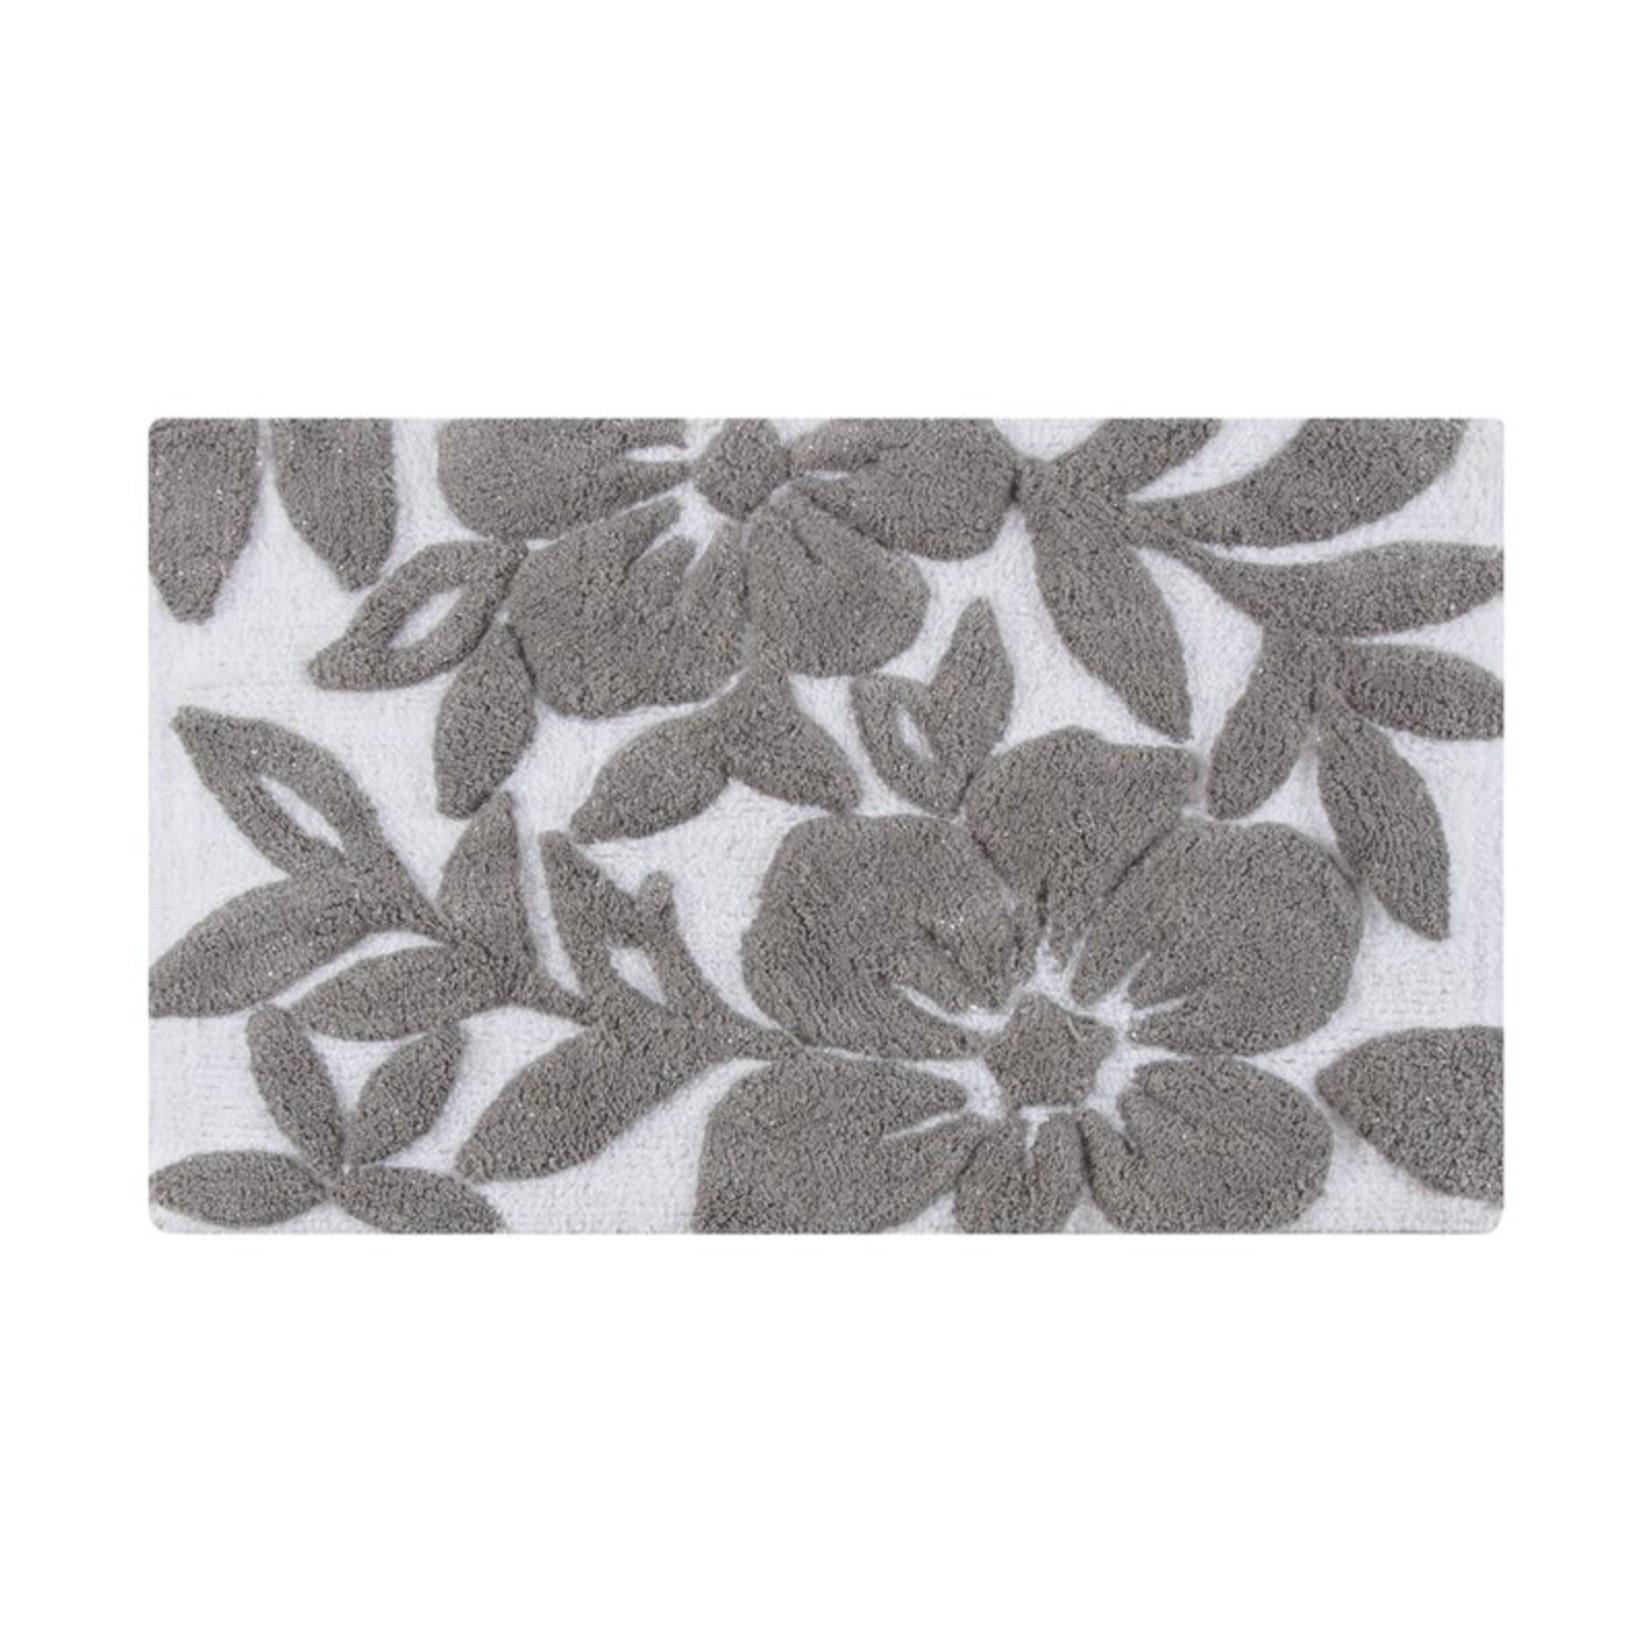 * 30'' W x 50'' L - Aticus Tufted Leaf Rectangle Plastic/Vinyl Non-Slip Floral Bath Rug - White/Grey